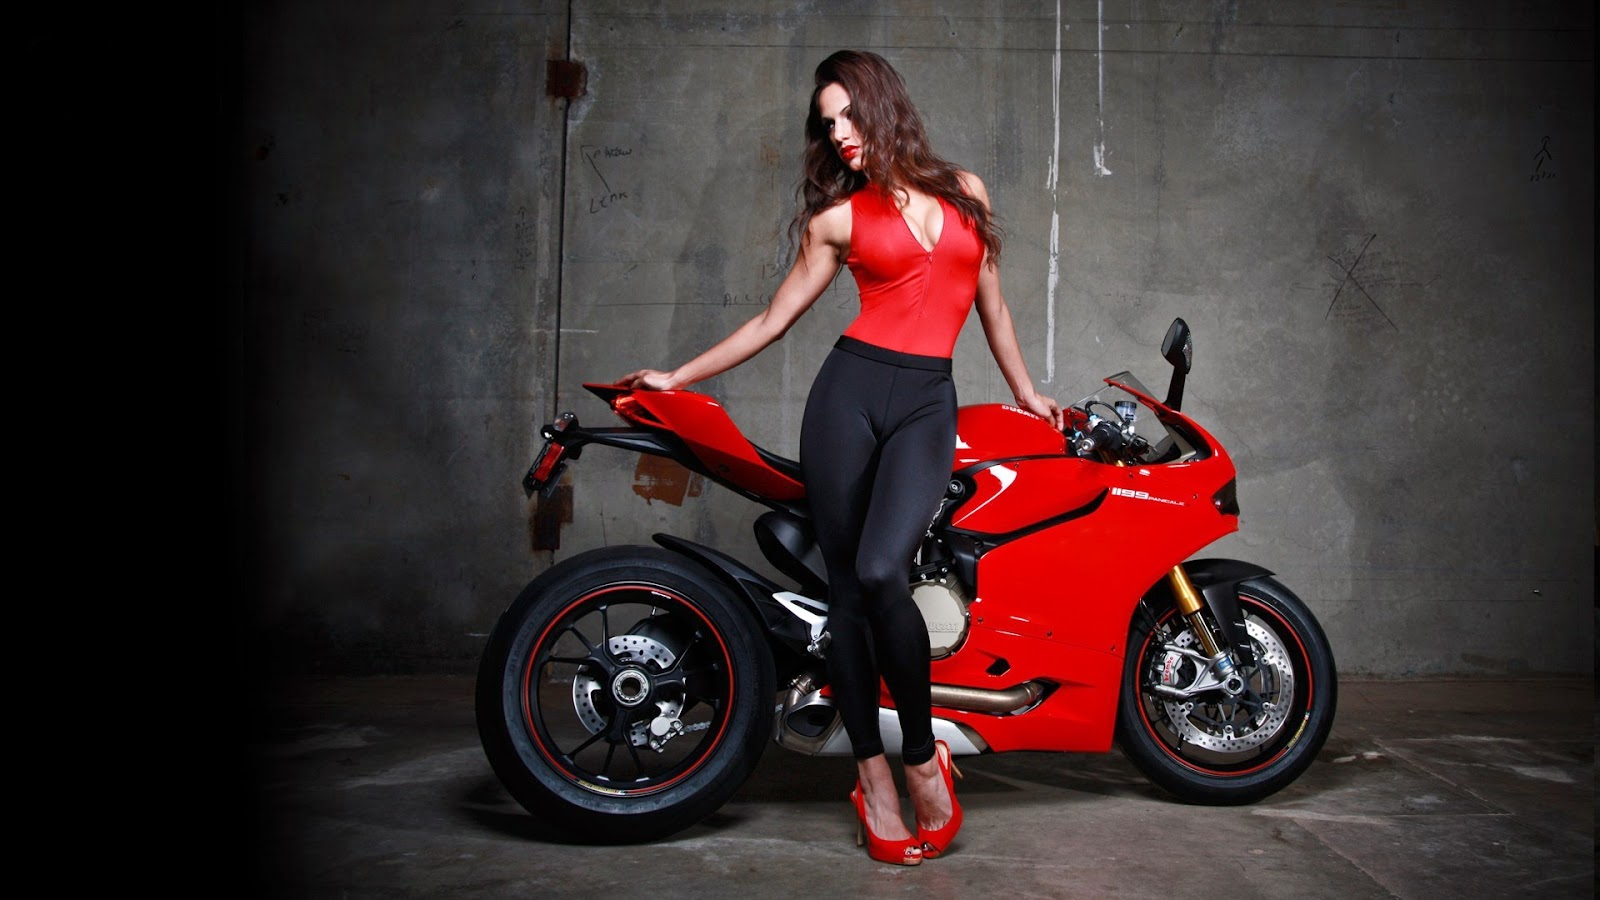 Superbike Desktop HD (high Definition) Wallpapers